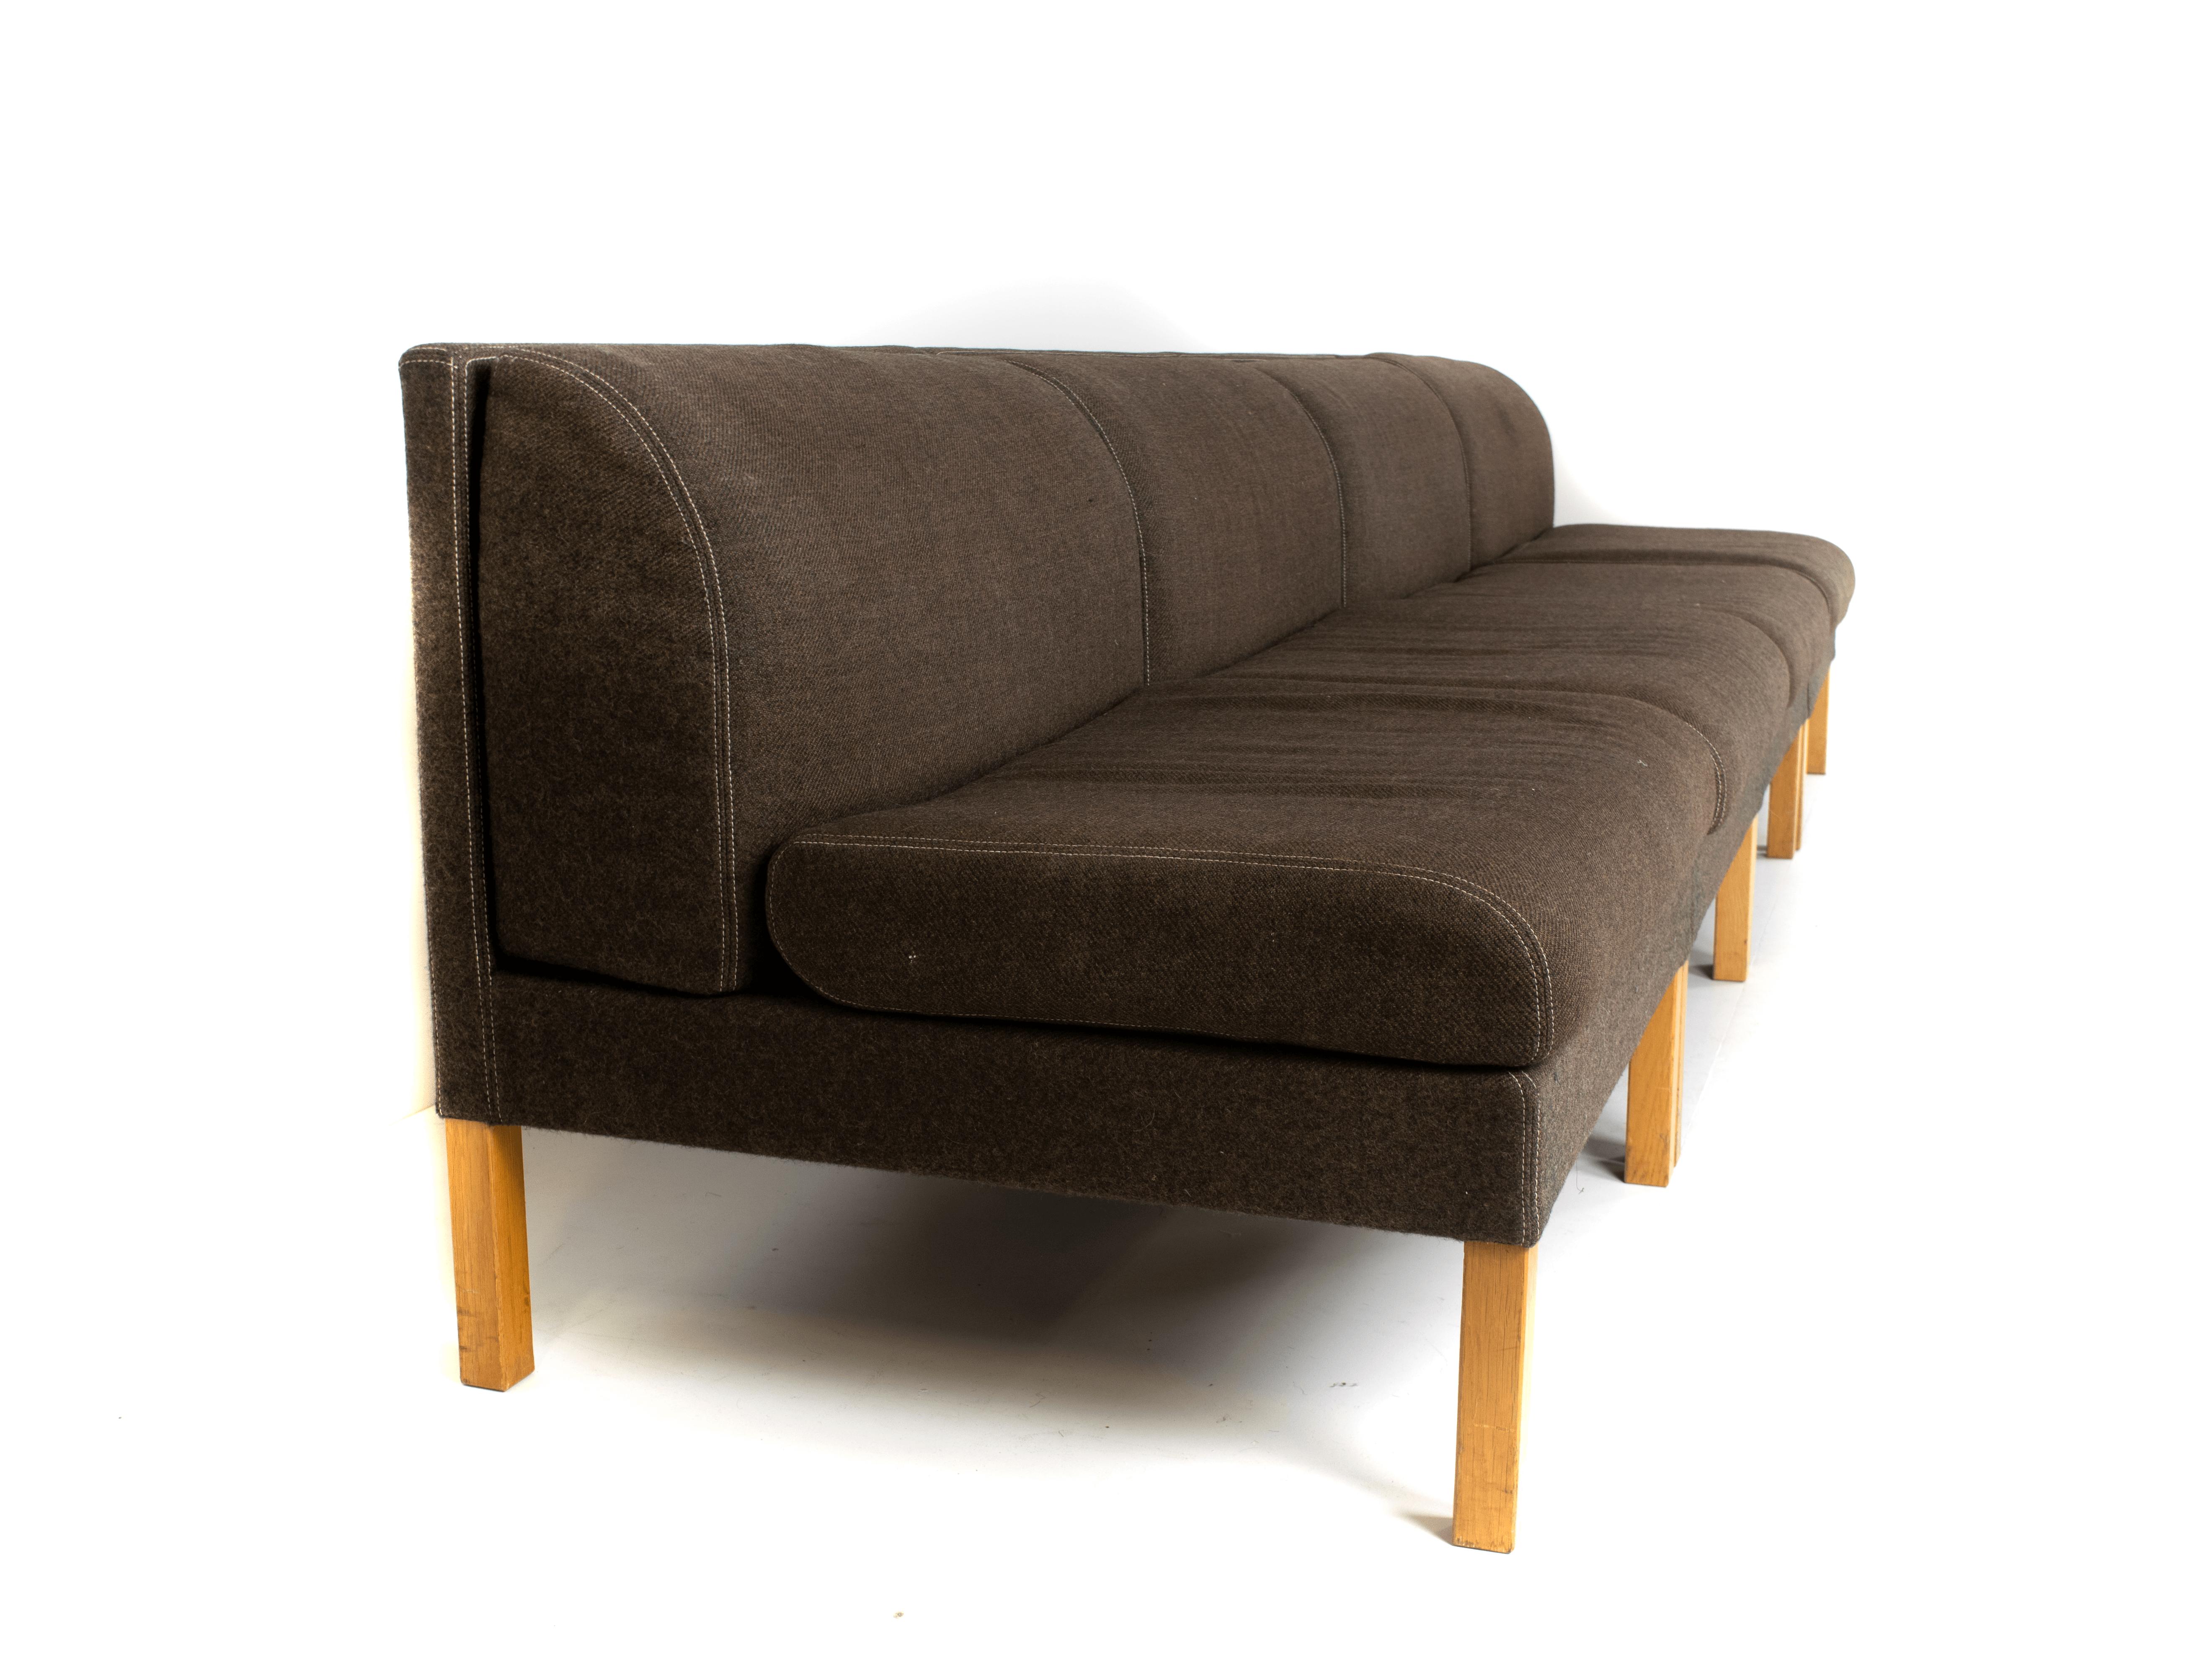 Side view Bernt Petersen Modular Sofa in Oak and Saga 180 Fabric, Denmark 1980